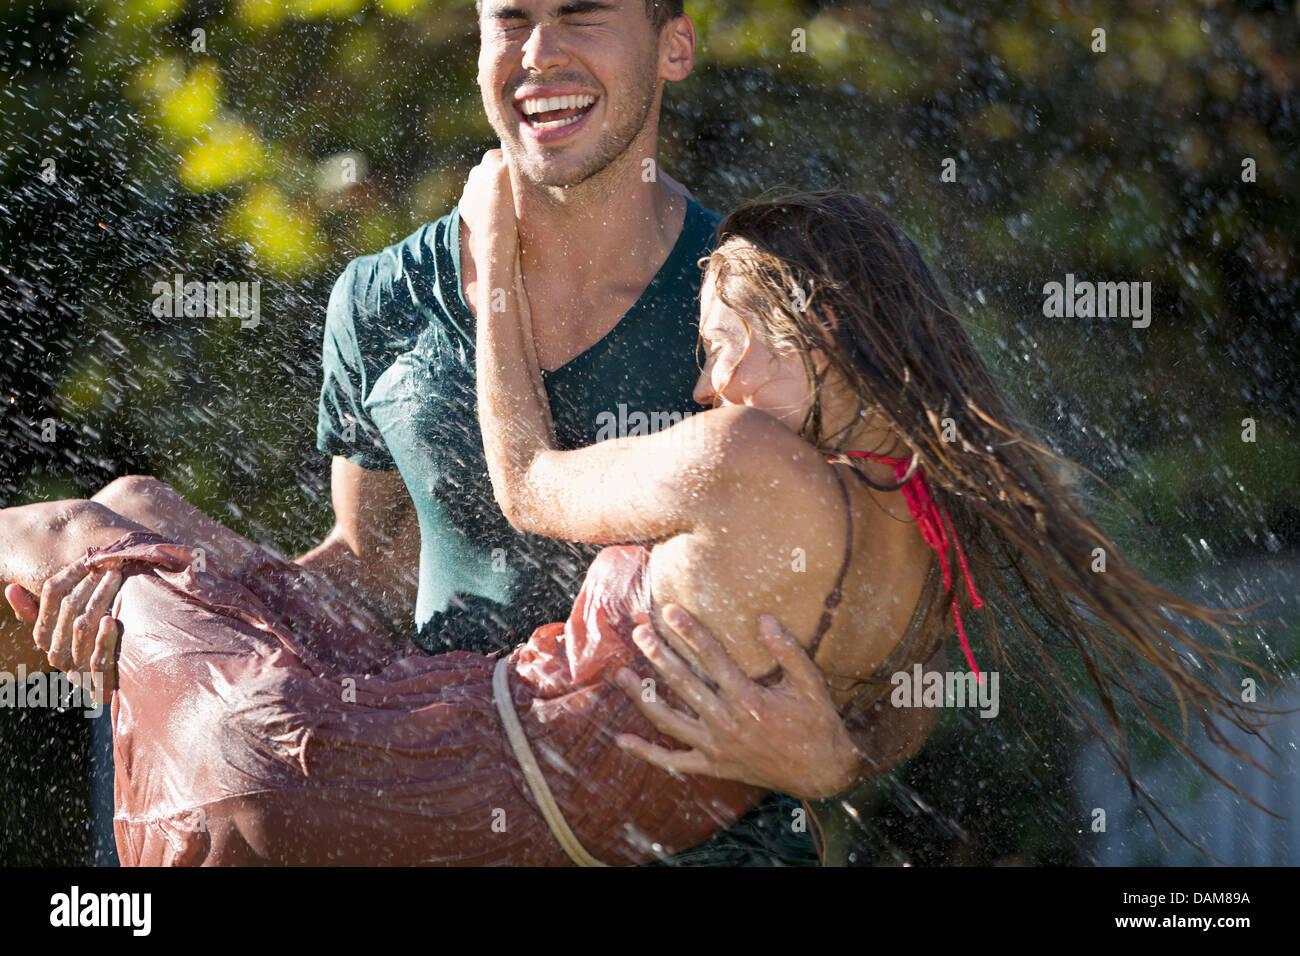 Couple playing in sprinkler in backyard - Stock Image